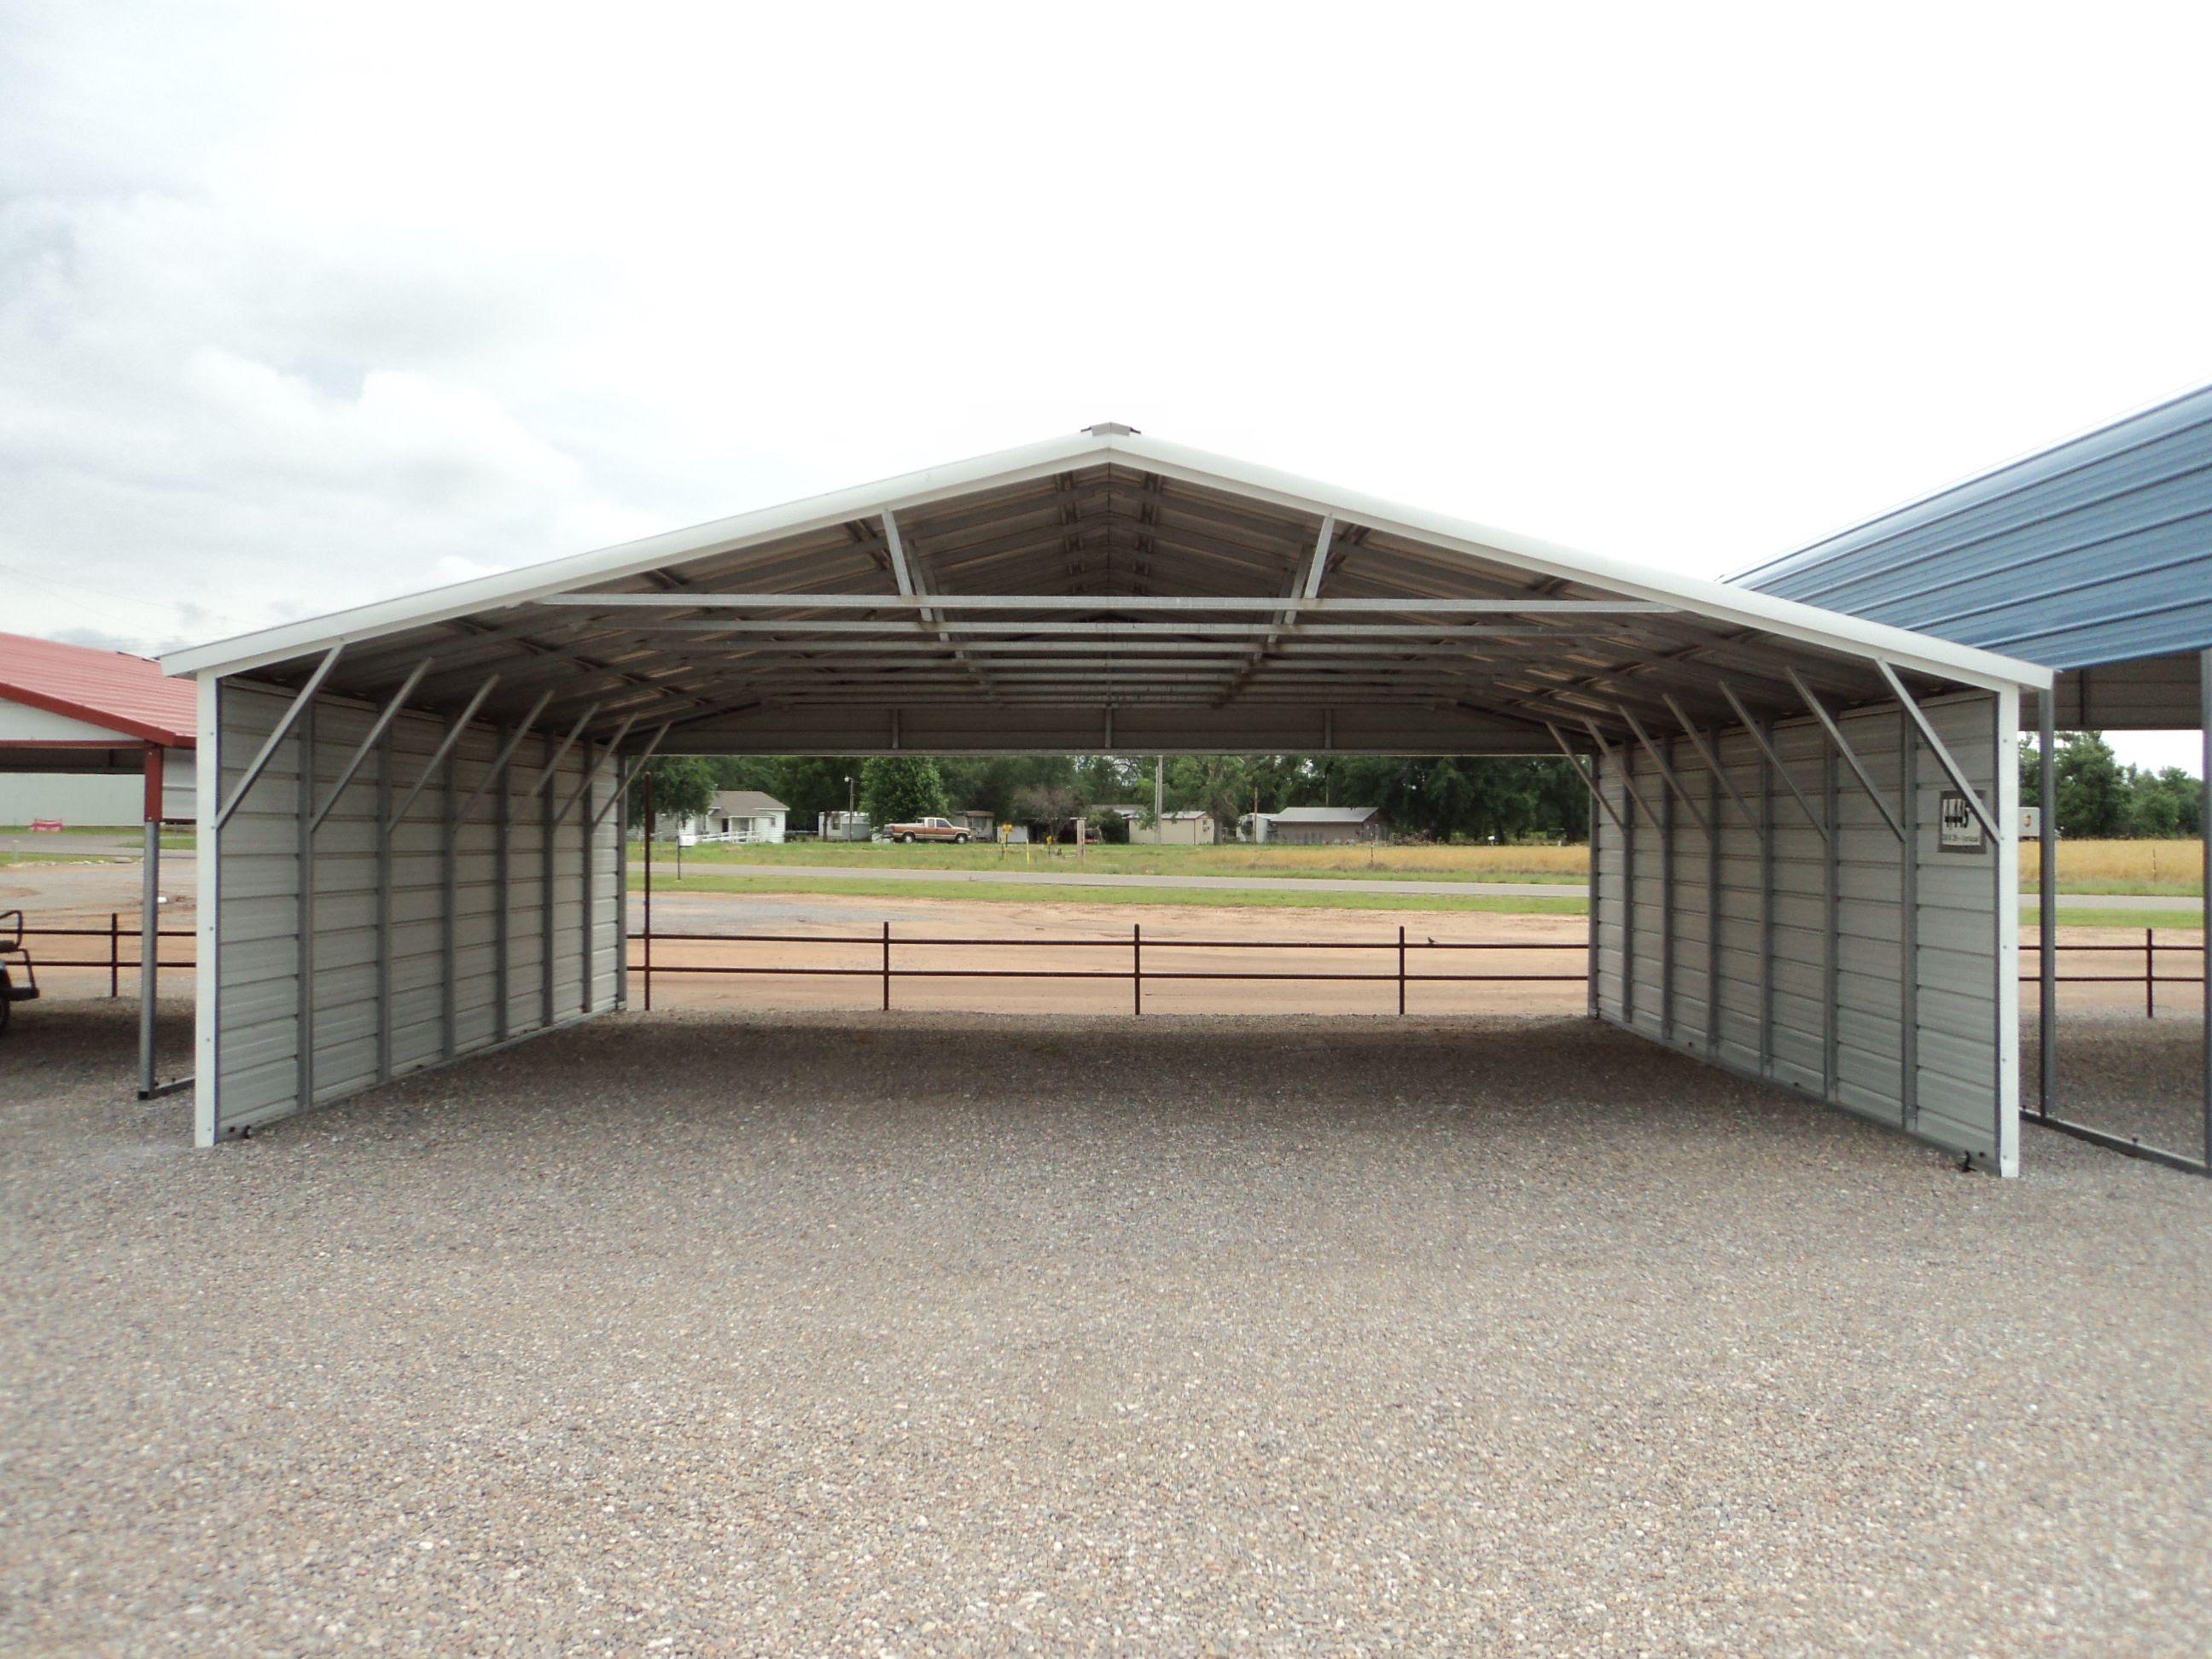 Texwin Carports